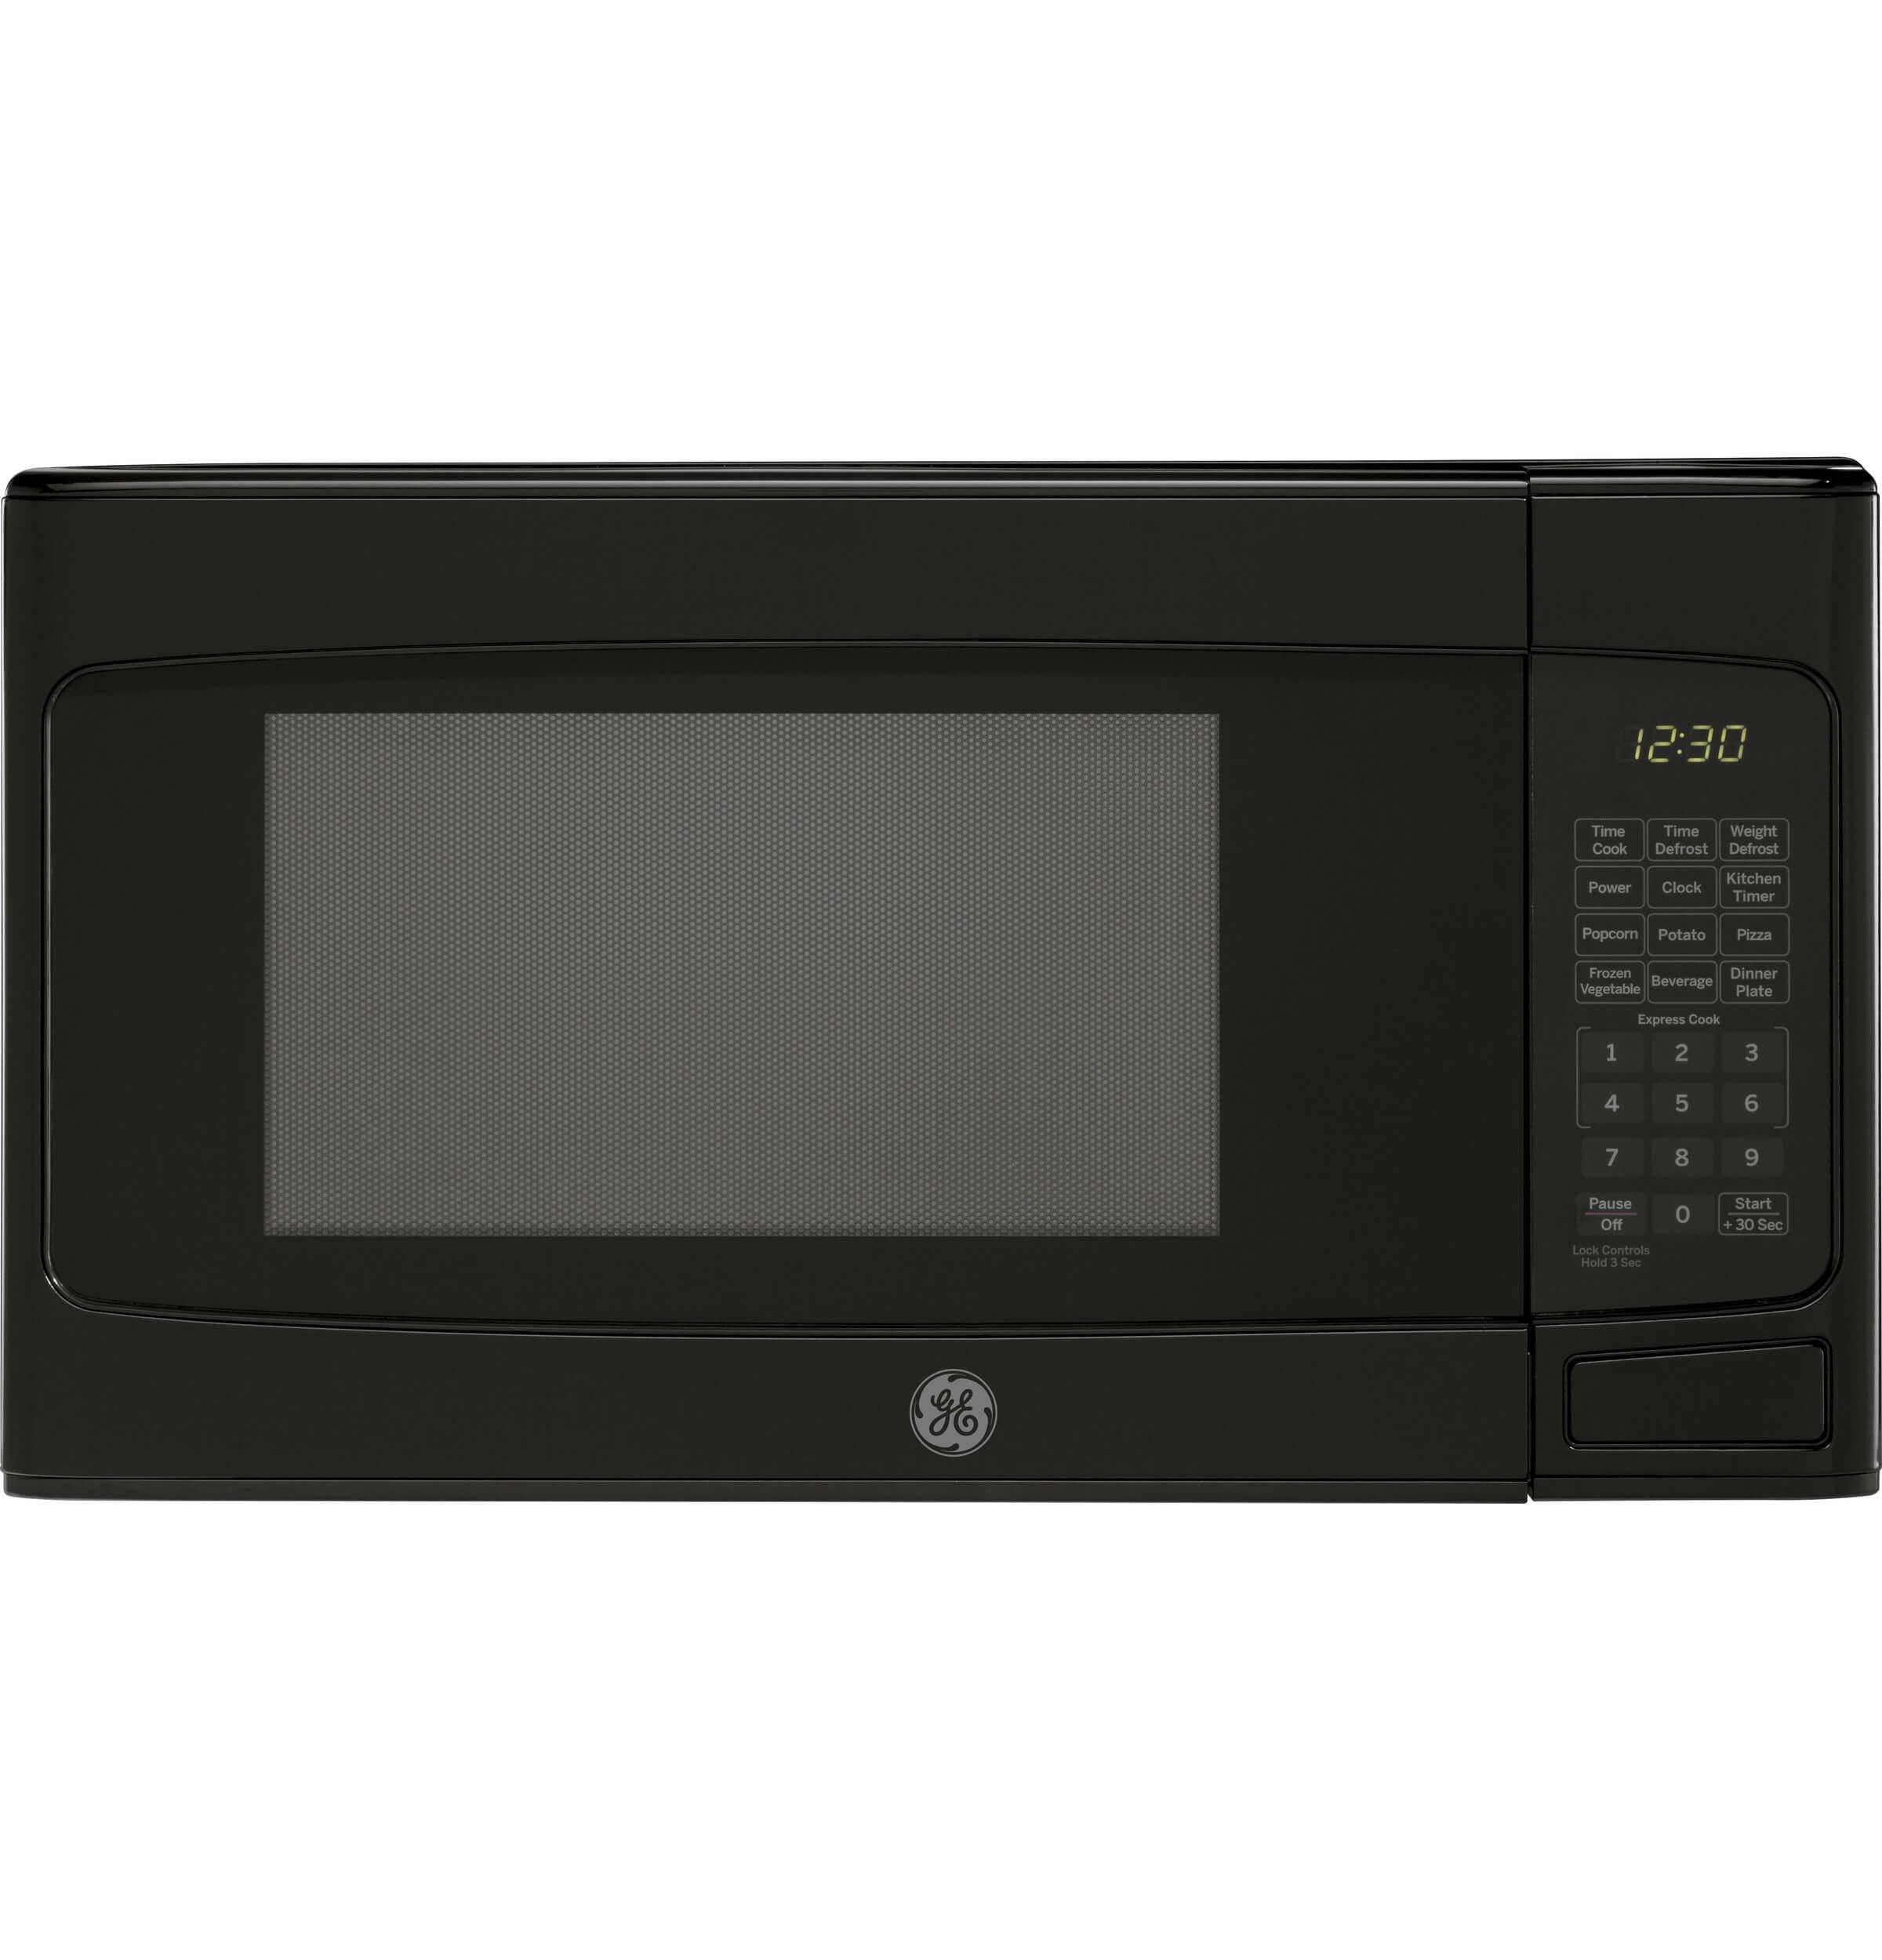 GE JES1145DMBB Microwave Oven